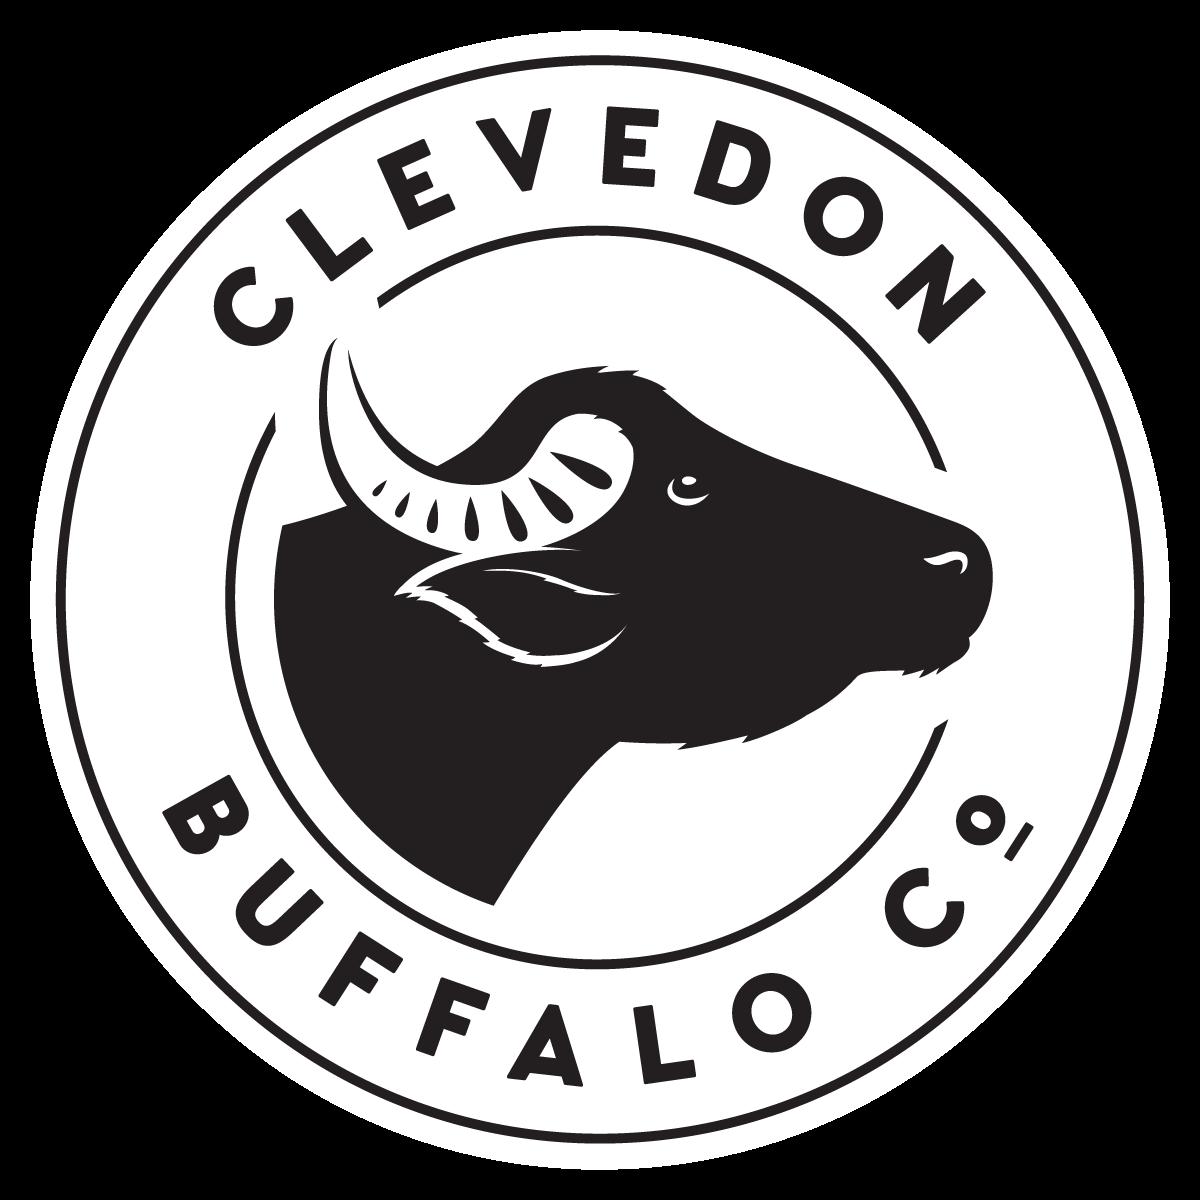 ClevedonBuffalo.png